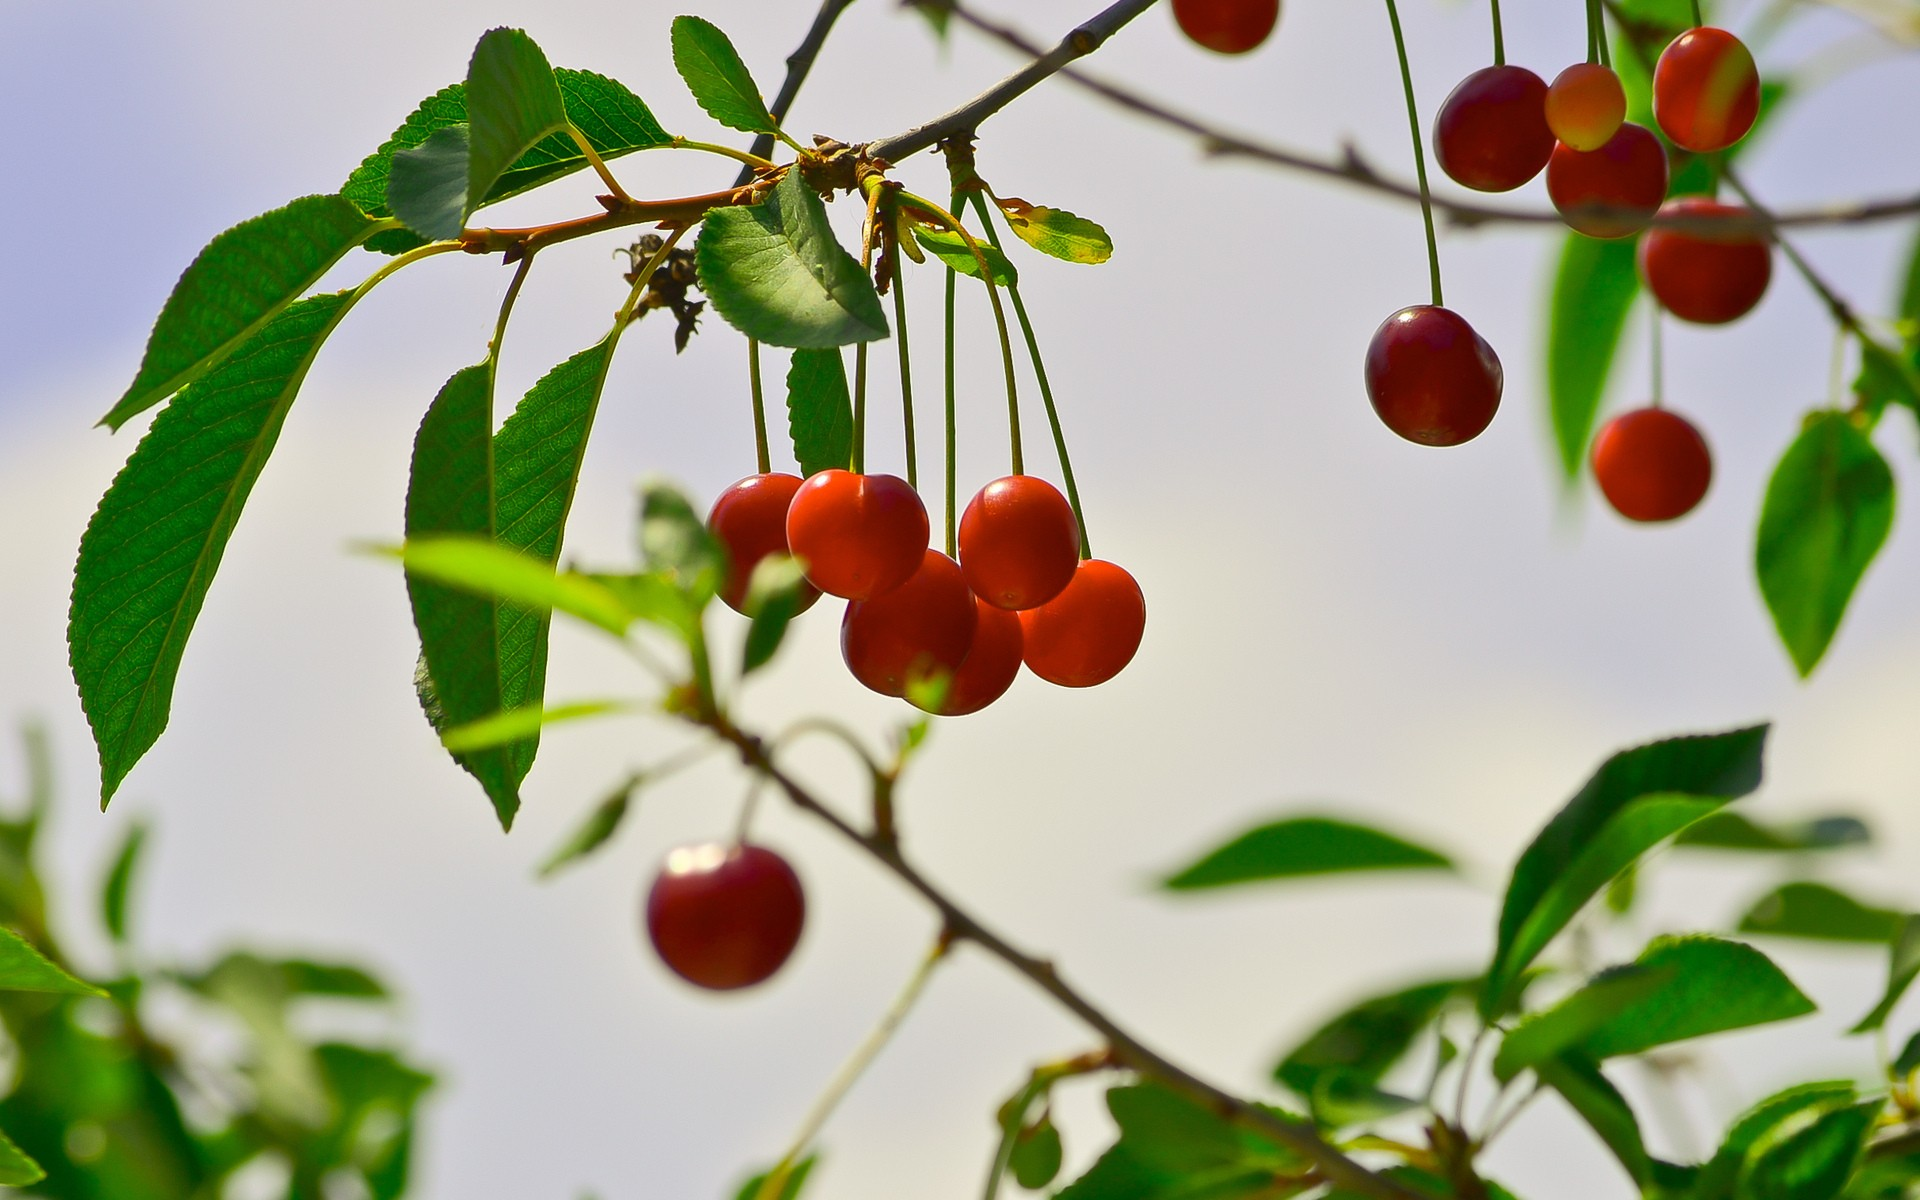 Fruits leaves depth of field fruit trees wallpaper ...